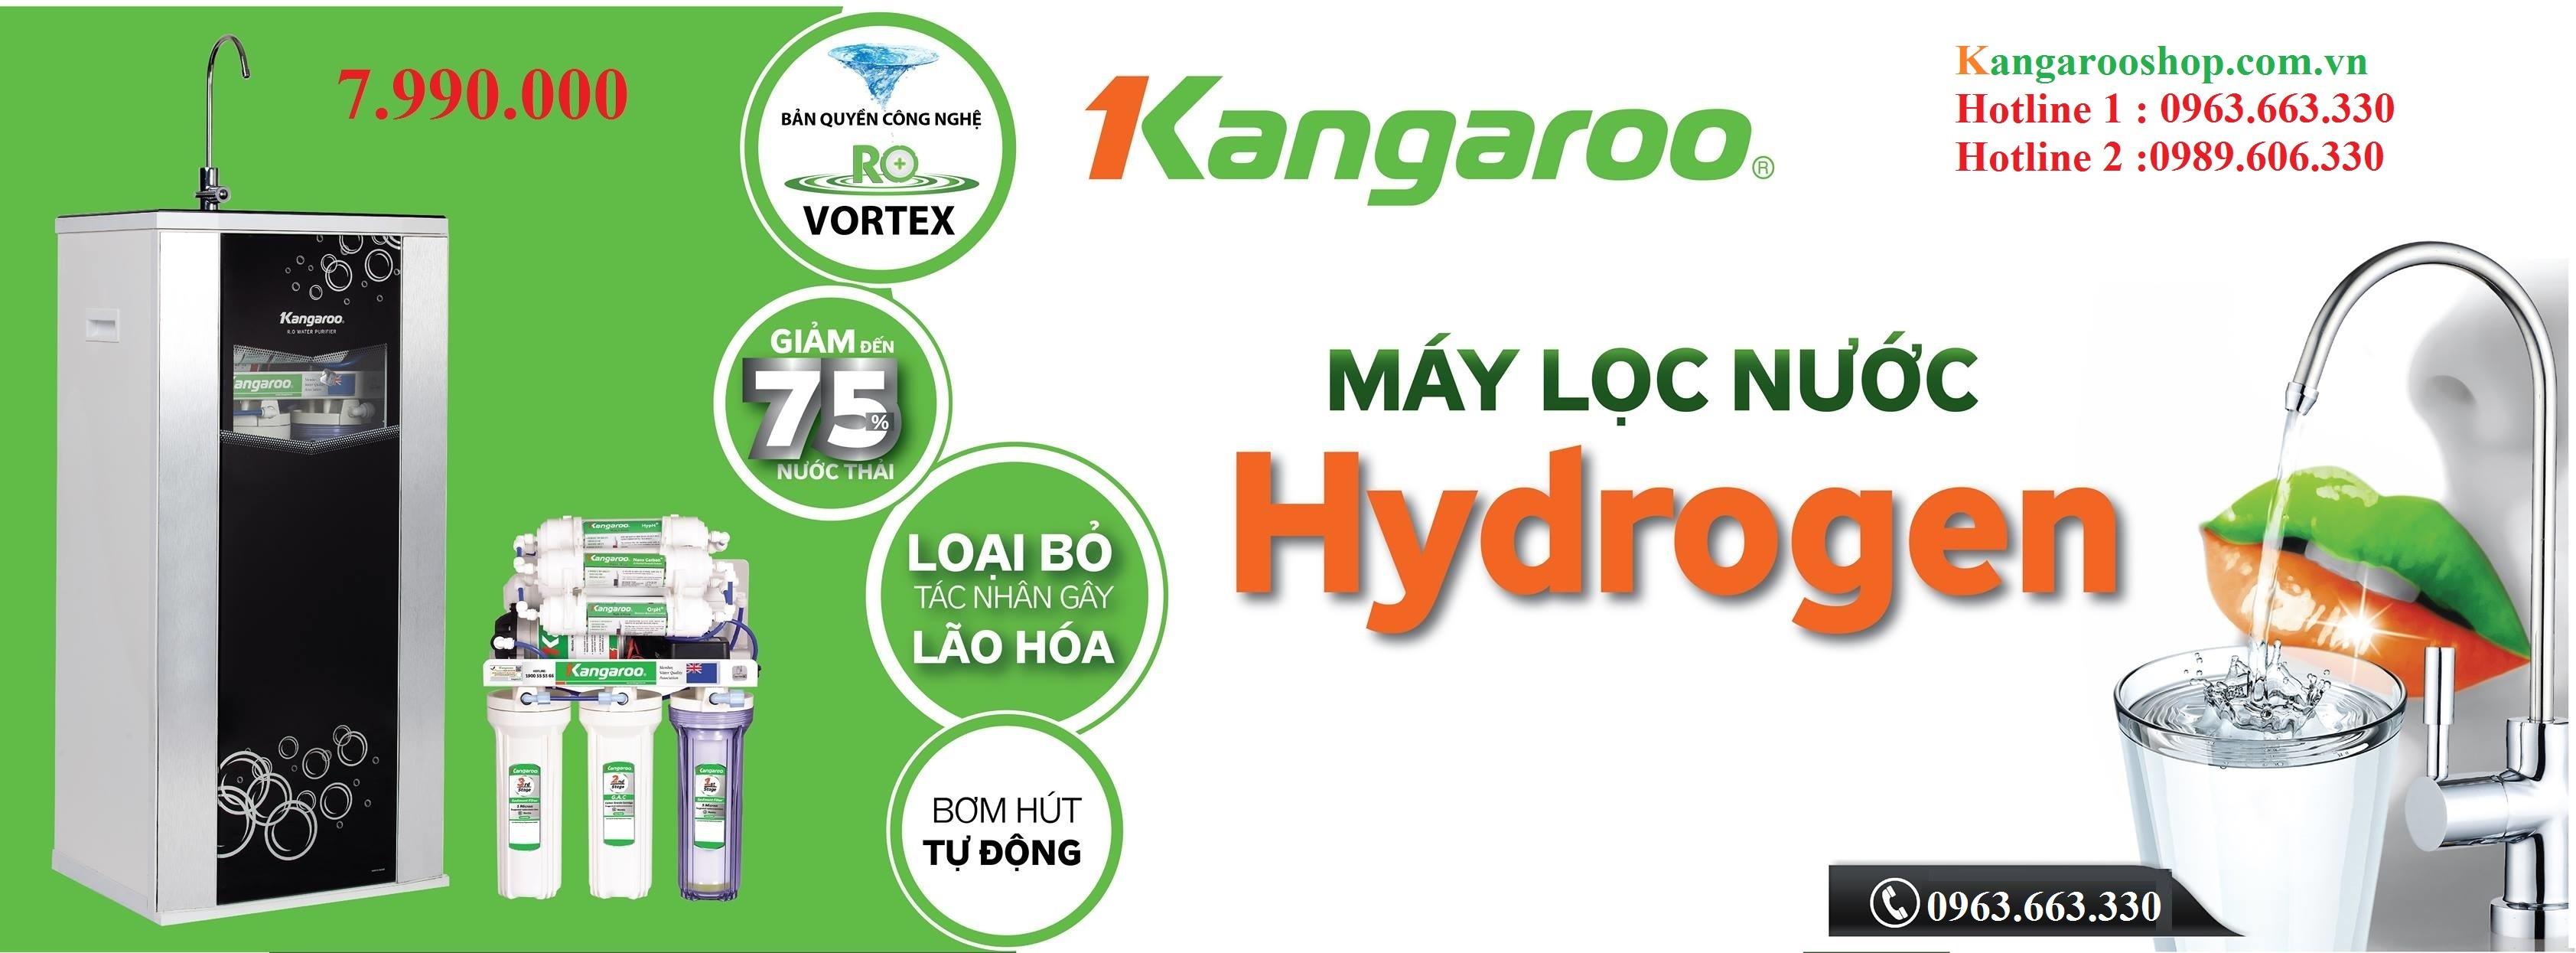 may-loc-nuoc-kangaroo-hydrogen moi